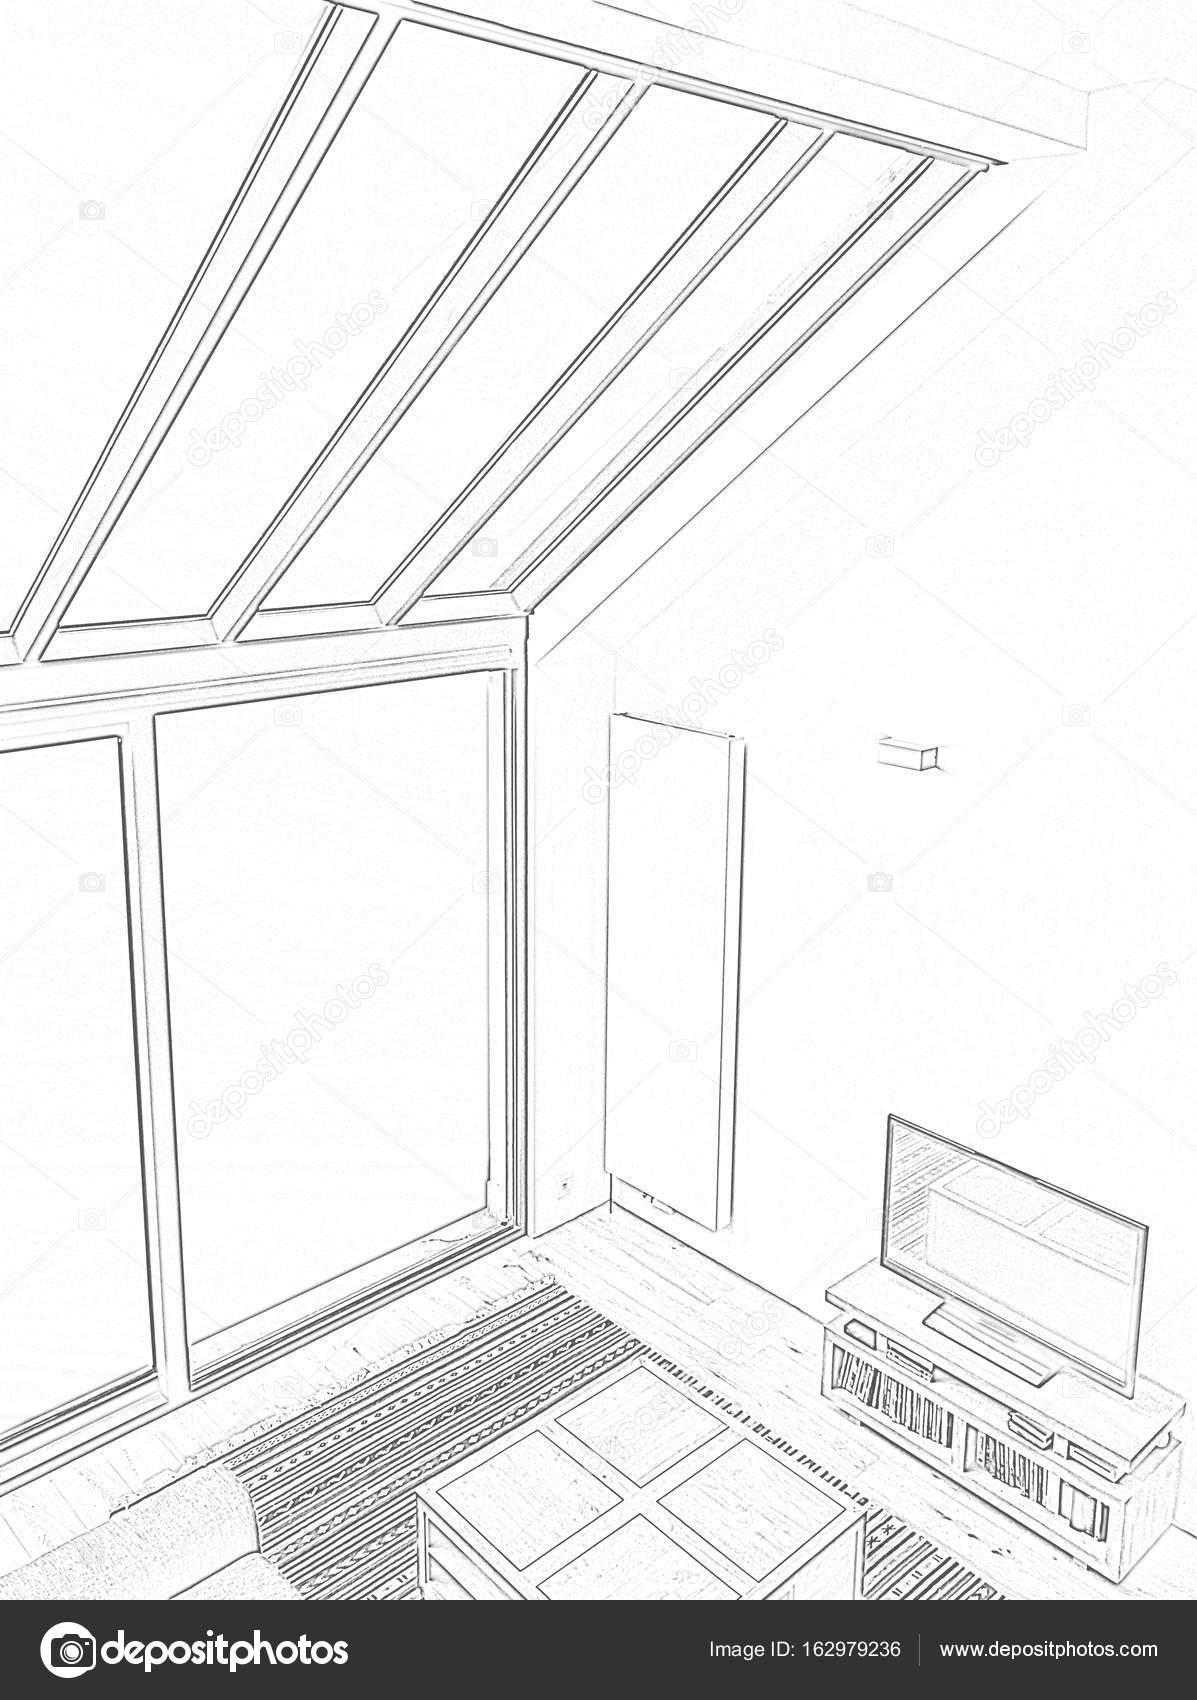 https://st3.depositphotos.com/1029099/16297/i/1600/depositphotos_162979236-stockafbeelding-tekening-en-geplande-moderne-woonkamer.jpg